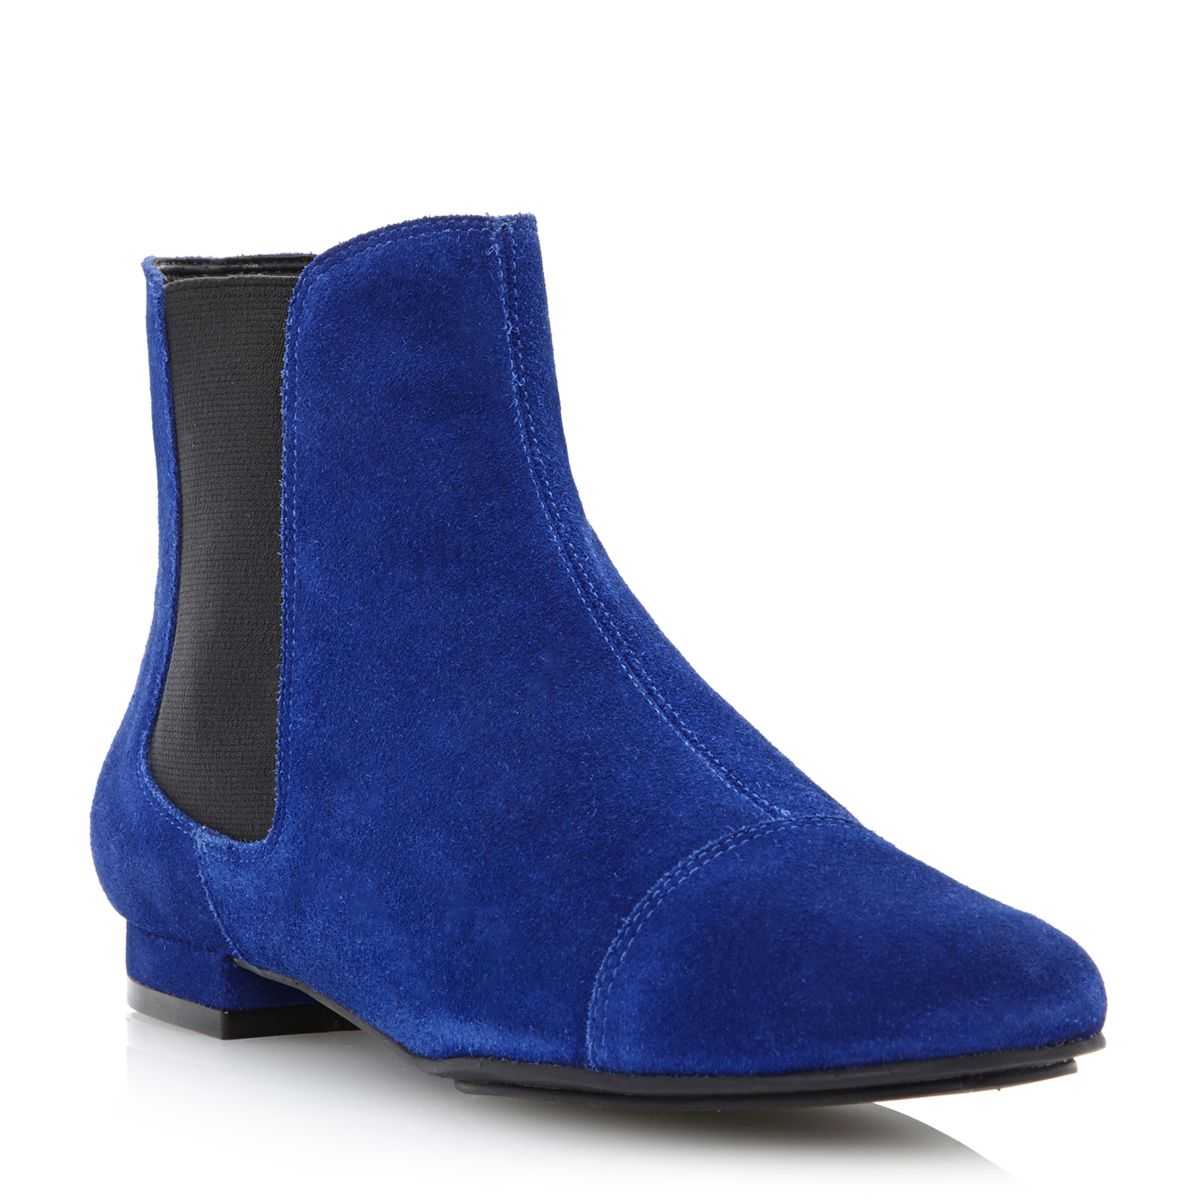 bertie petter womens blue elasticated suede chelsea